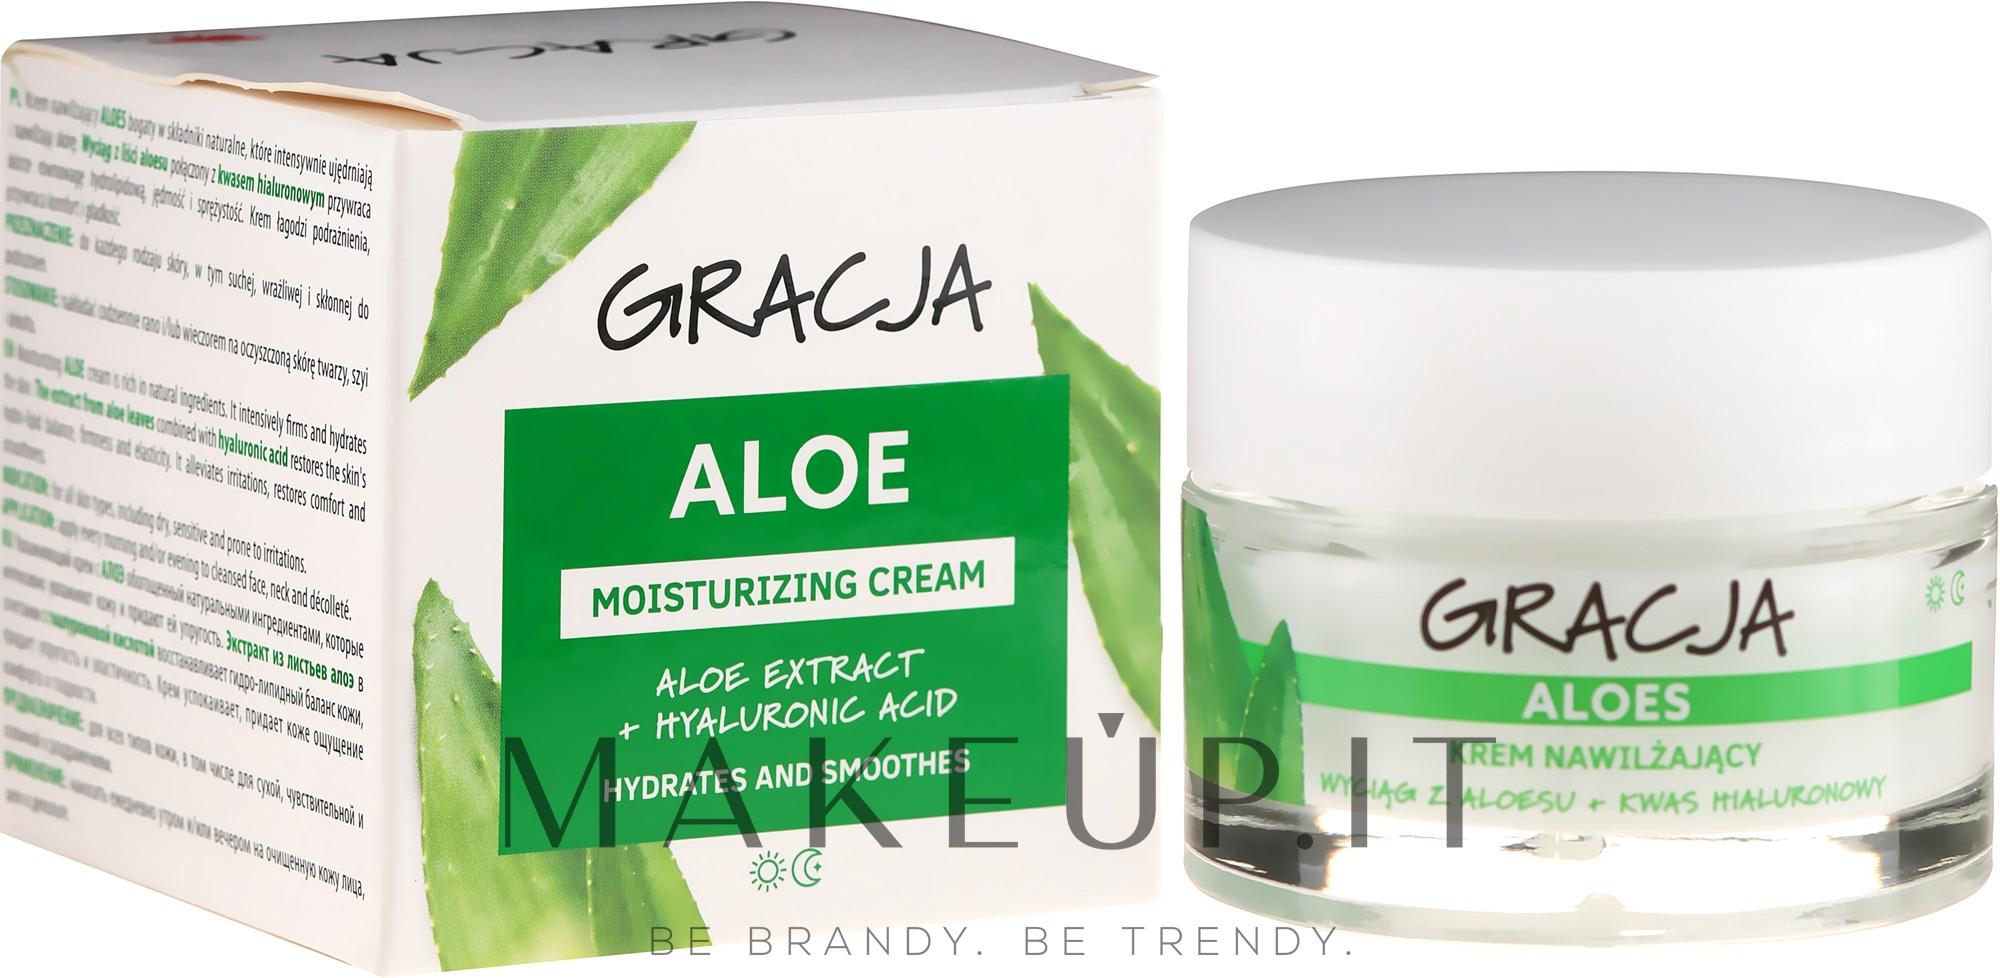 Gracja Aloe Moisturizing Face Cream - Crema Idratante..